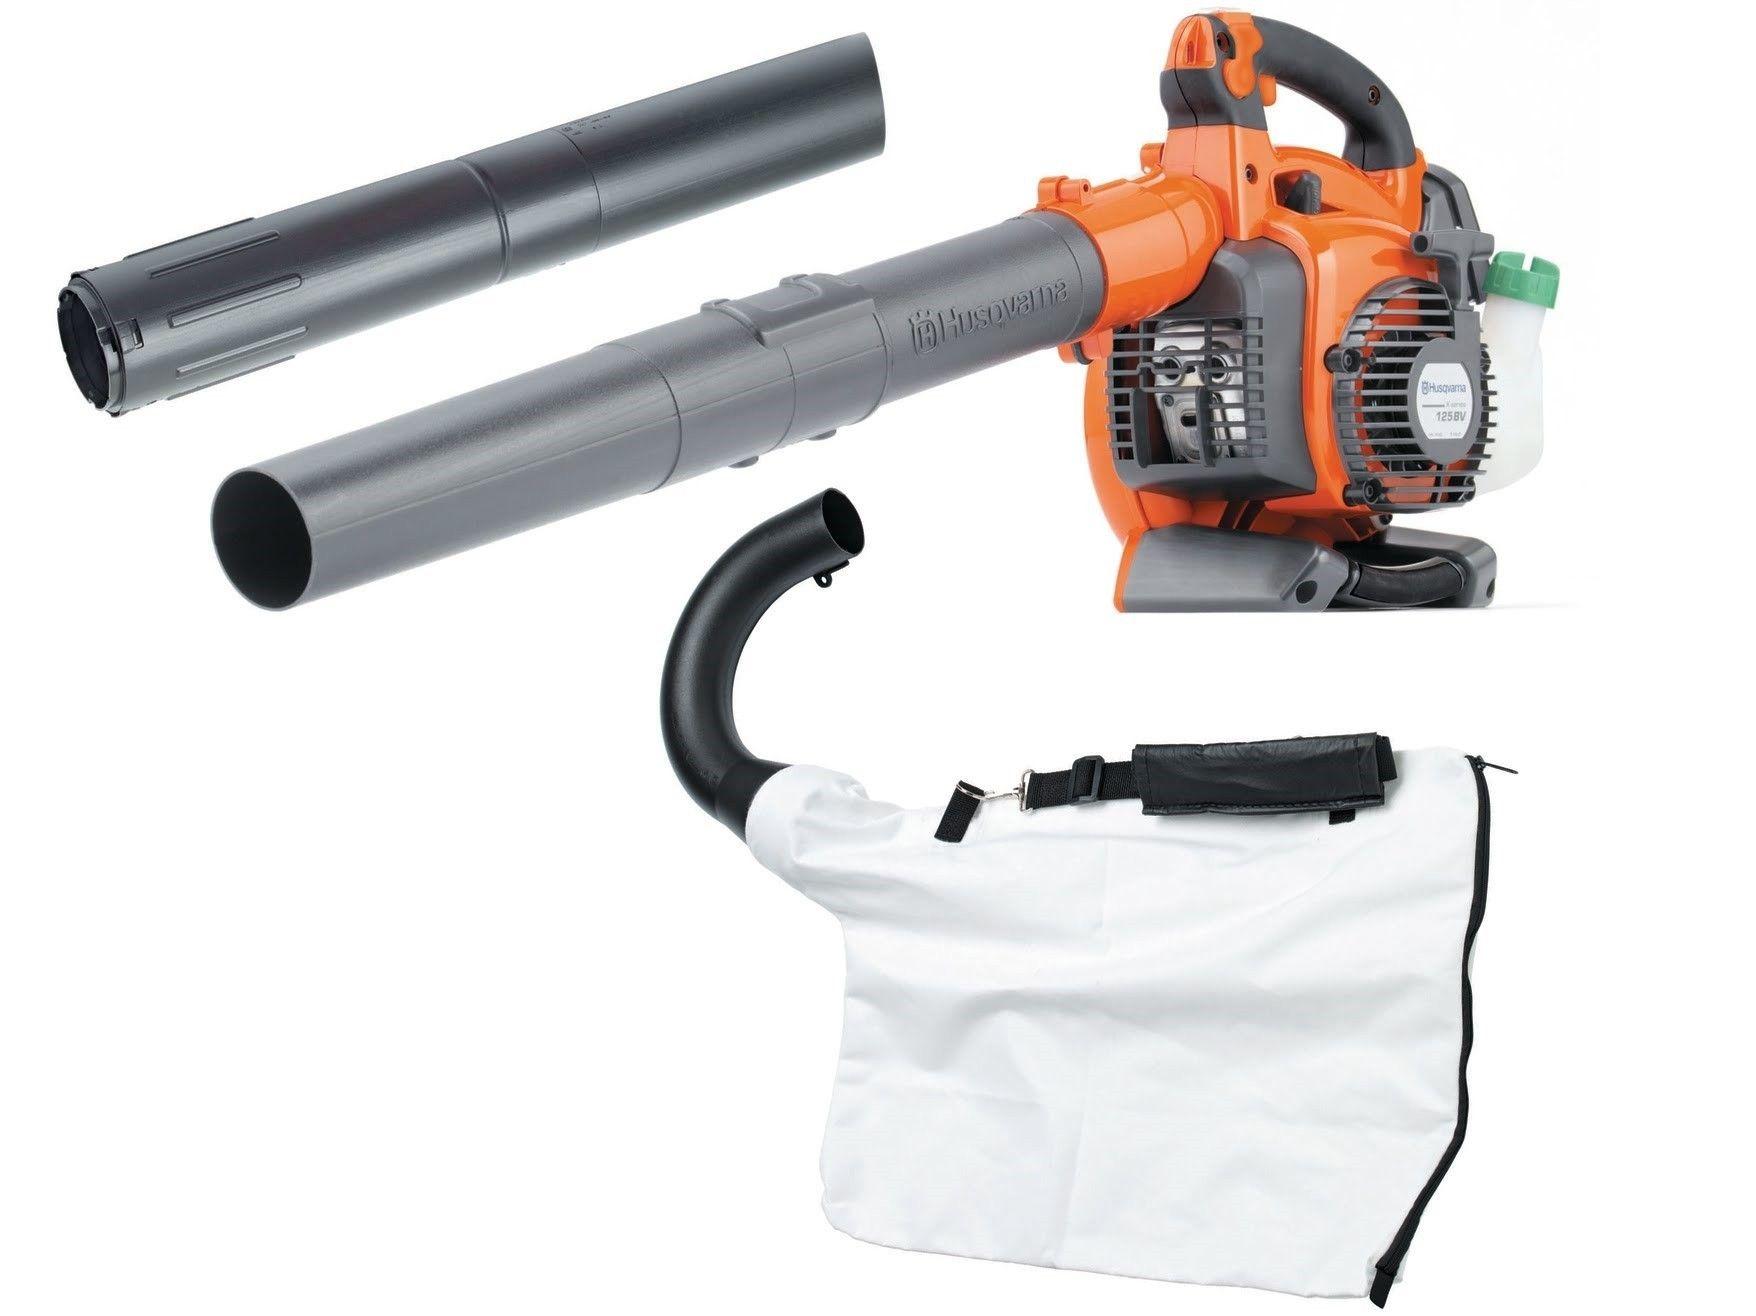 Gas Powered Leaf Blower Vacuum Mulcher Reviews Husqvarna 125bvx 28cc 2 Cycl